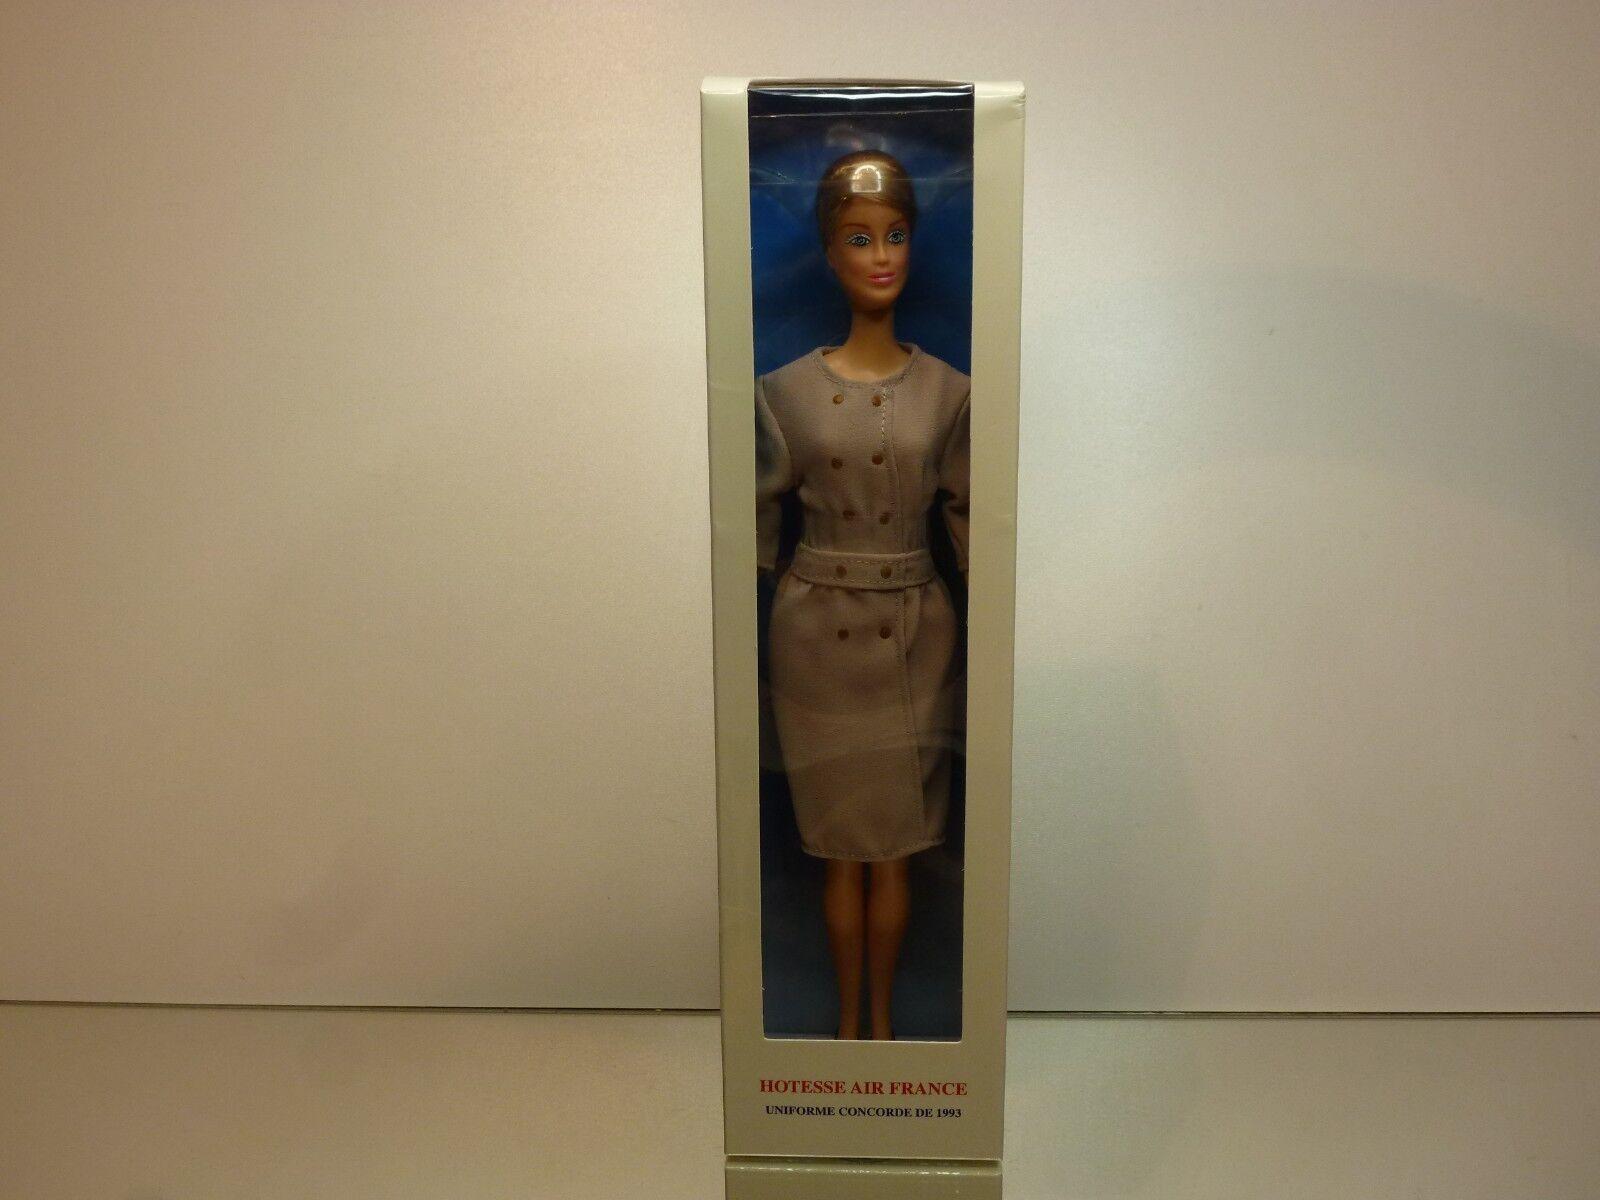 NOREV DOLL  HOTESSE AIR FRANCE UNIFORME CONCORDE 1993 - RARE - UNUSED IN  BOX